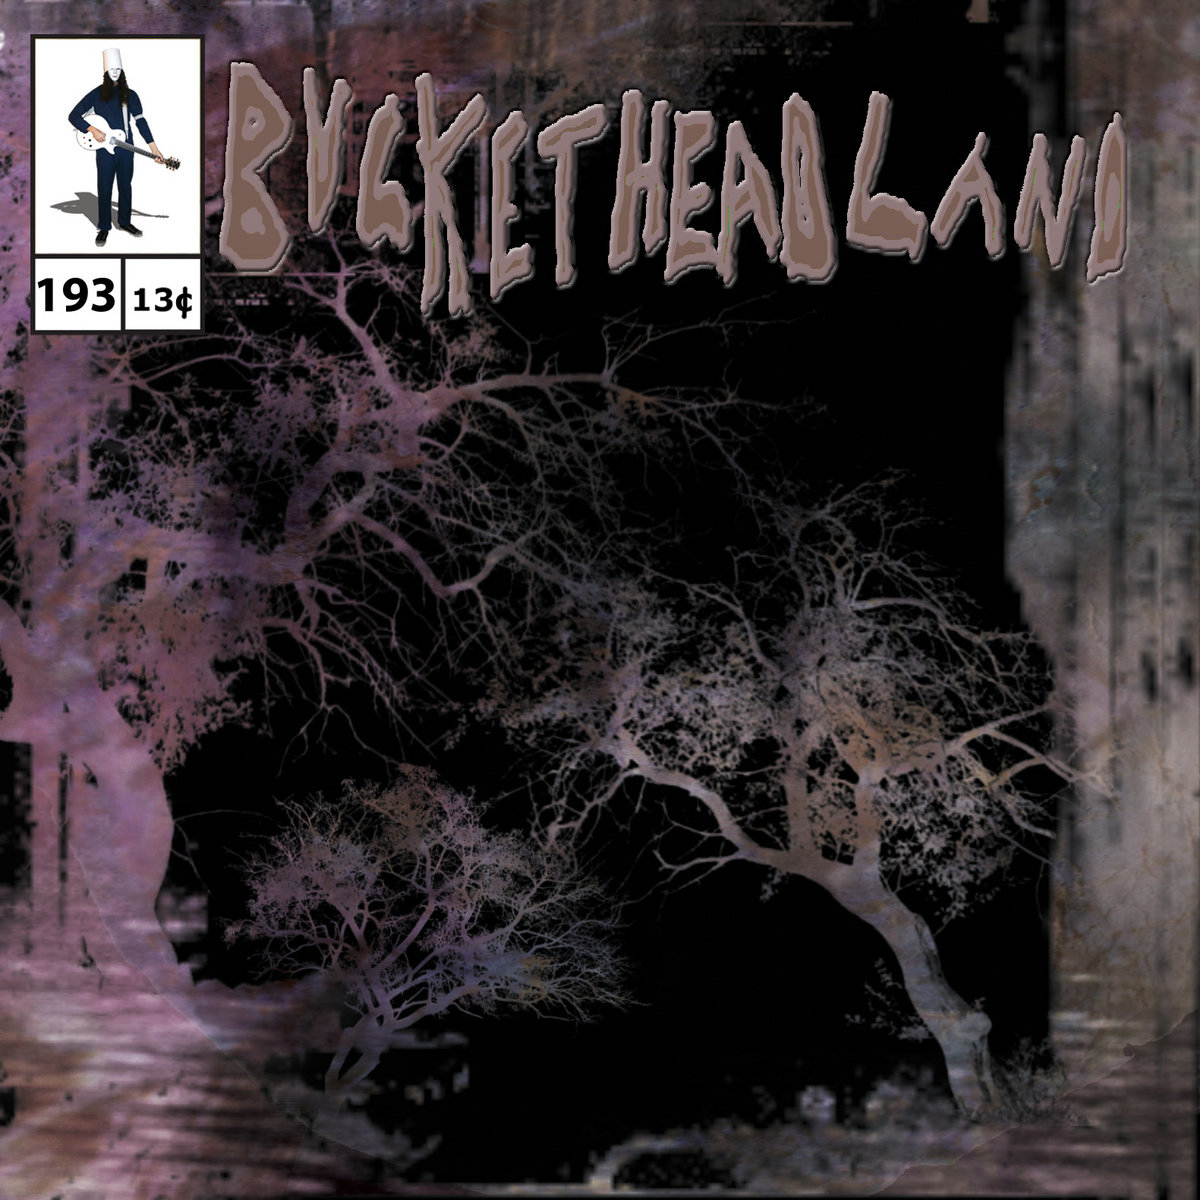 14 days til halloween: voice from the dead forest | bucketheadland